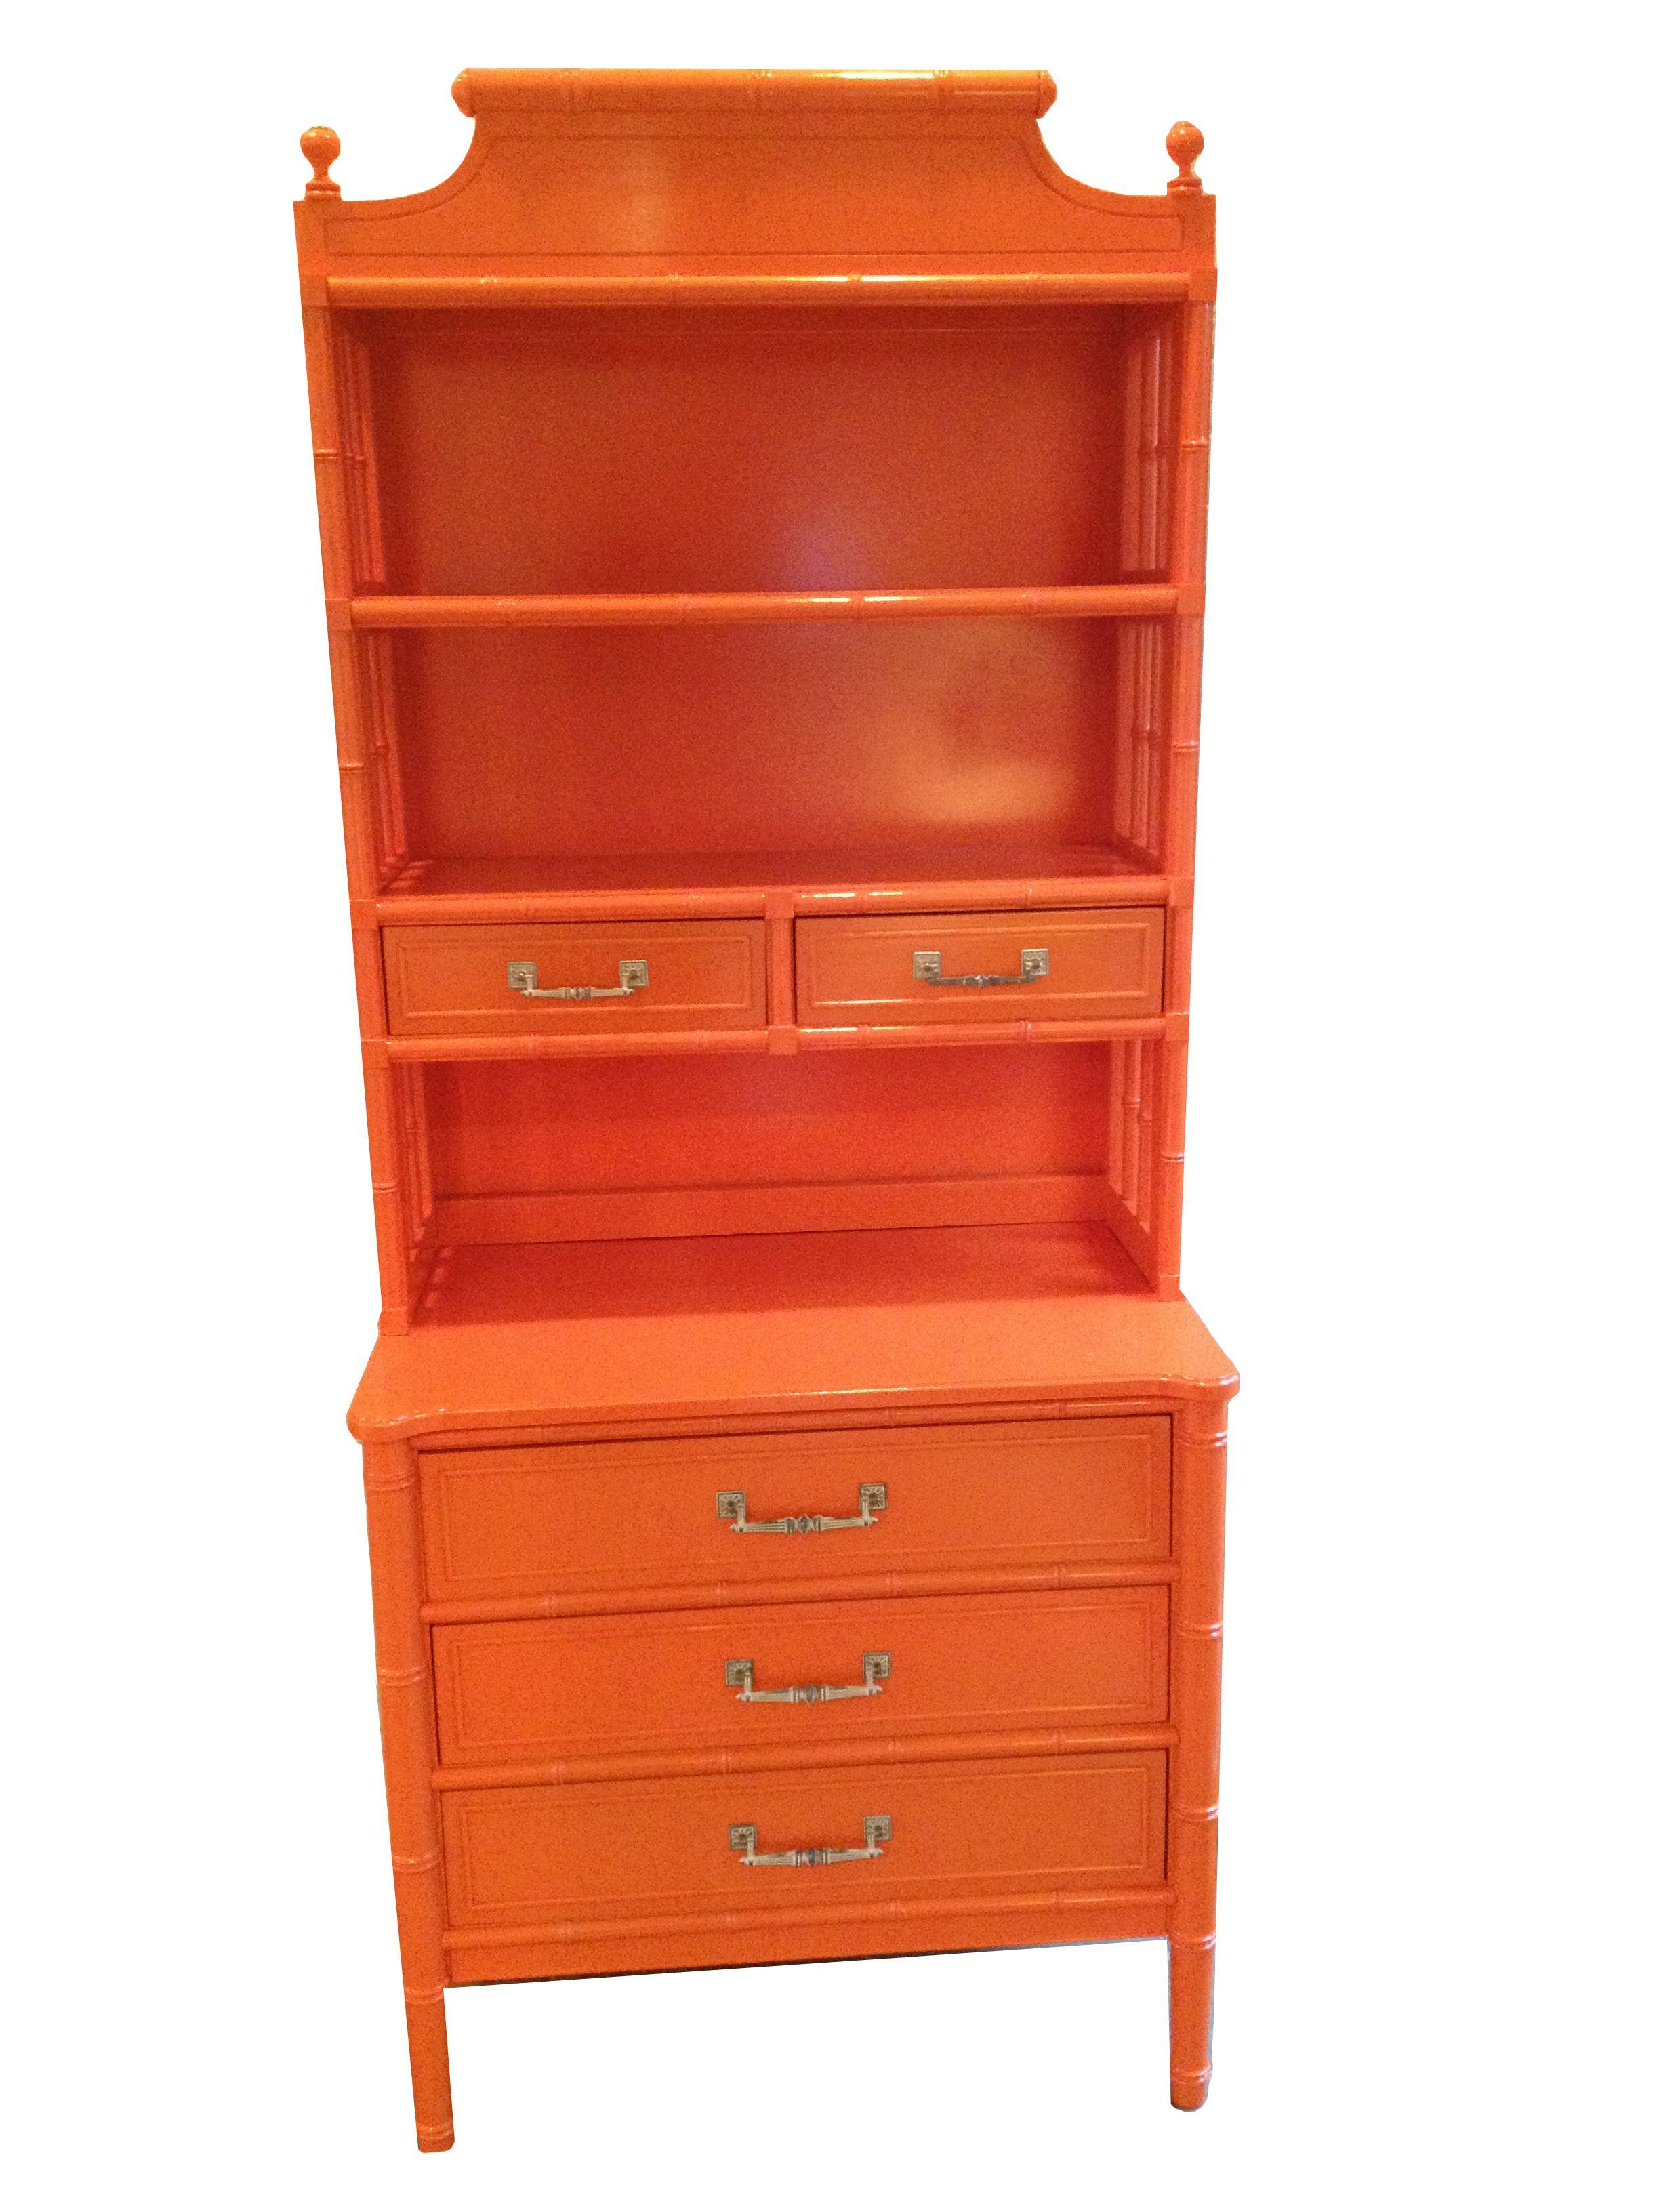 Thomasville Faux Bamboo Orange Lacquer Cabinet